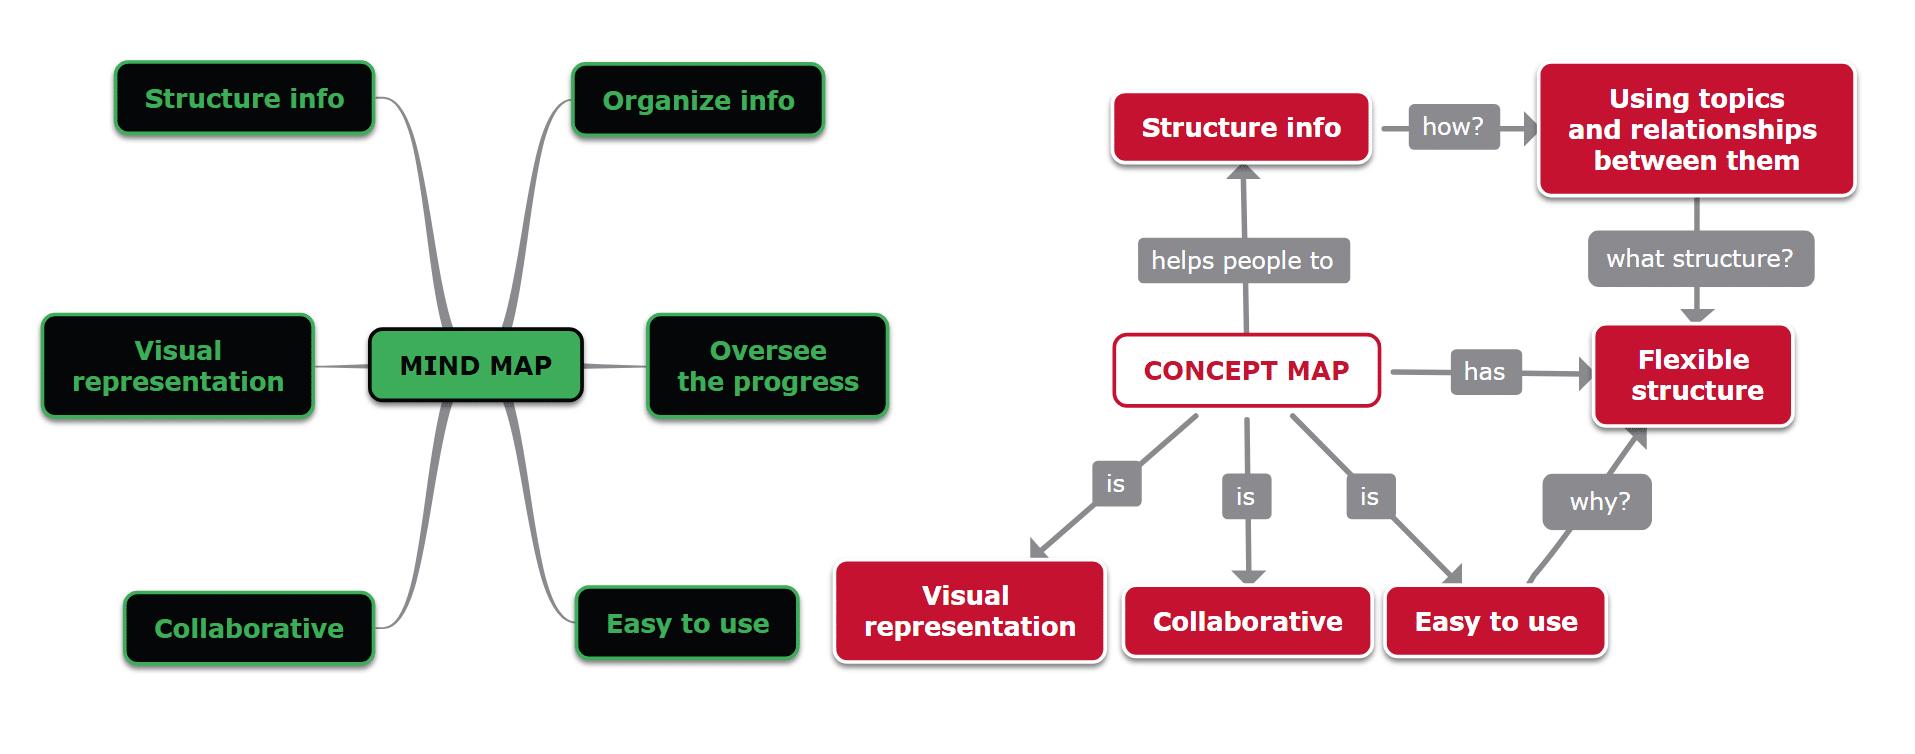 mind map vs concept map